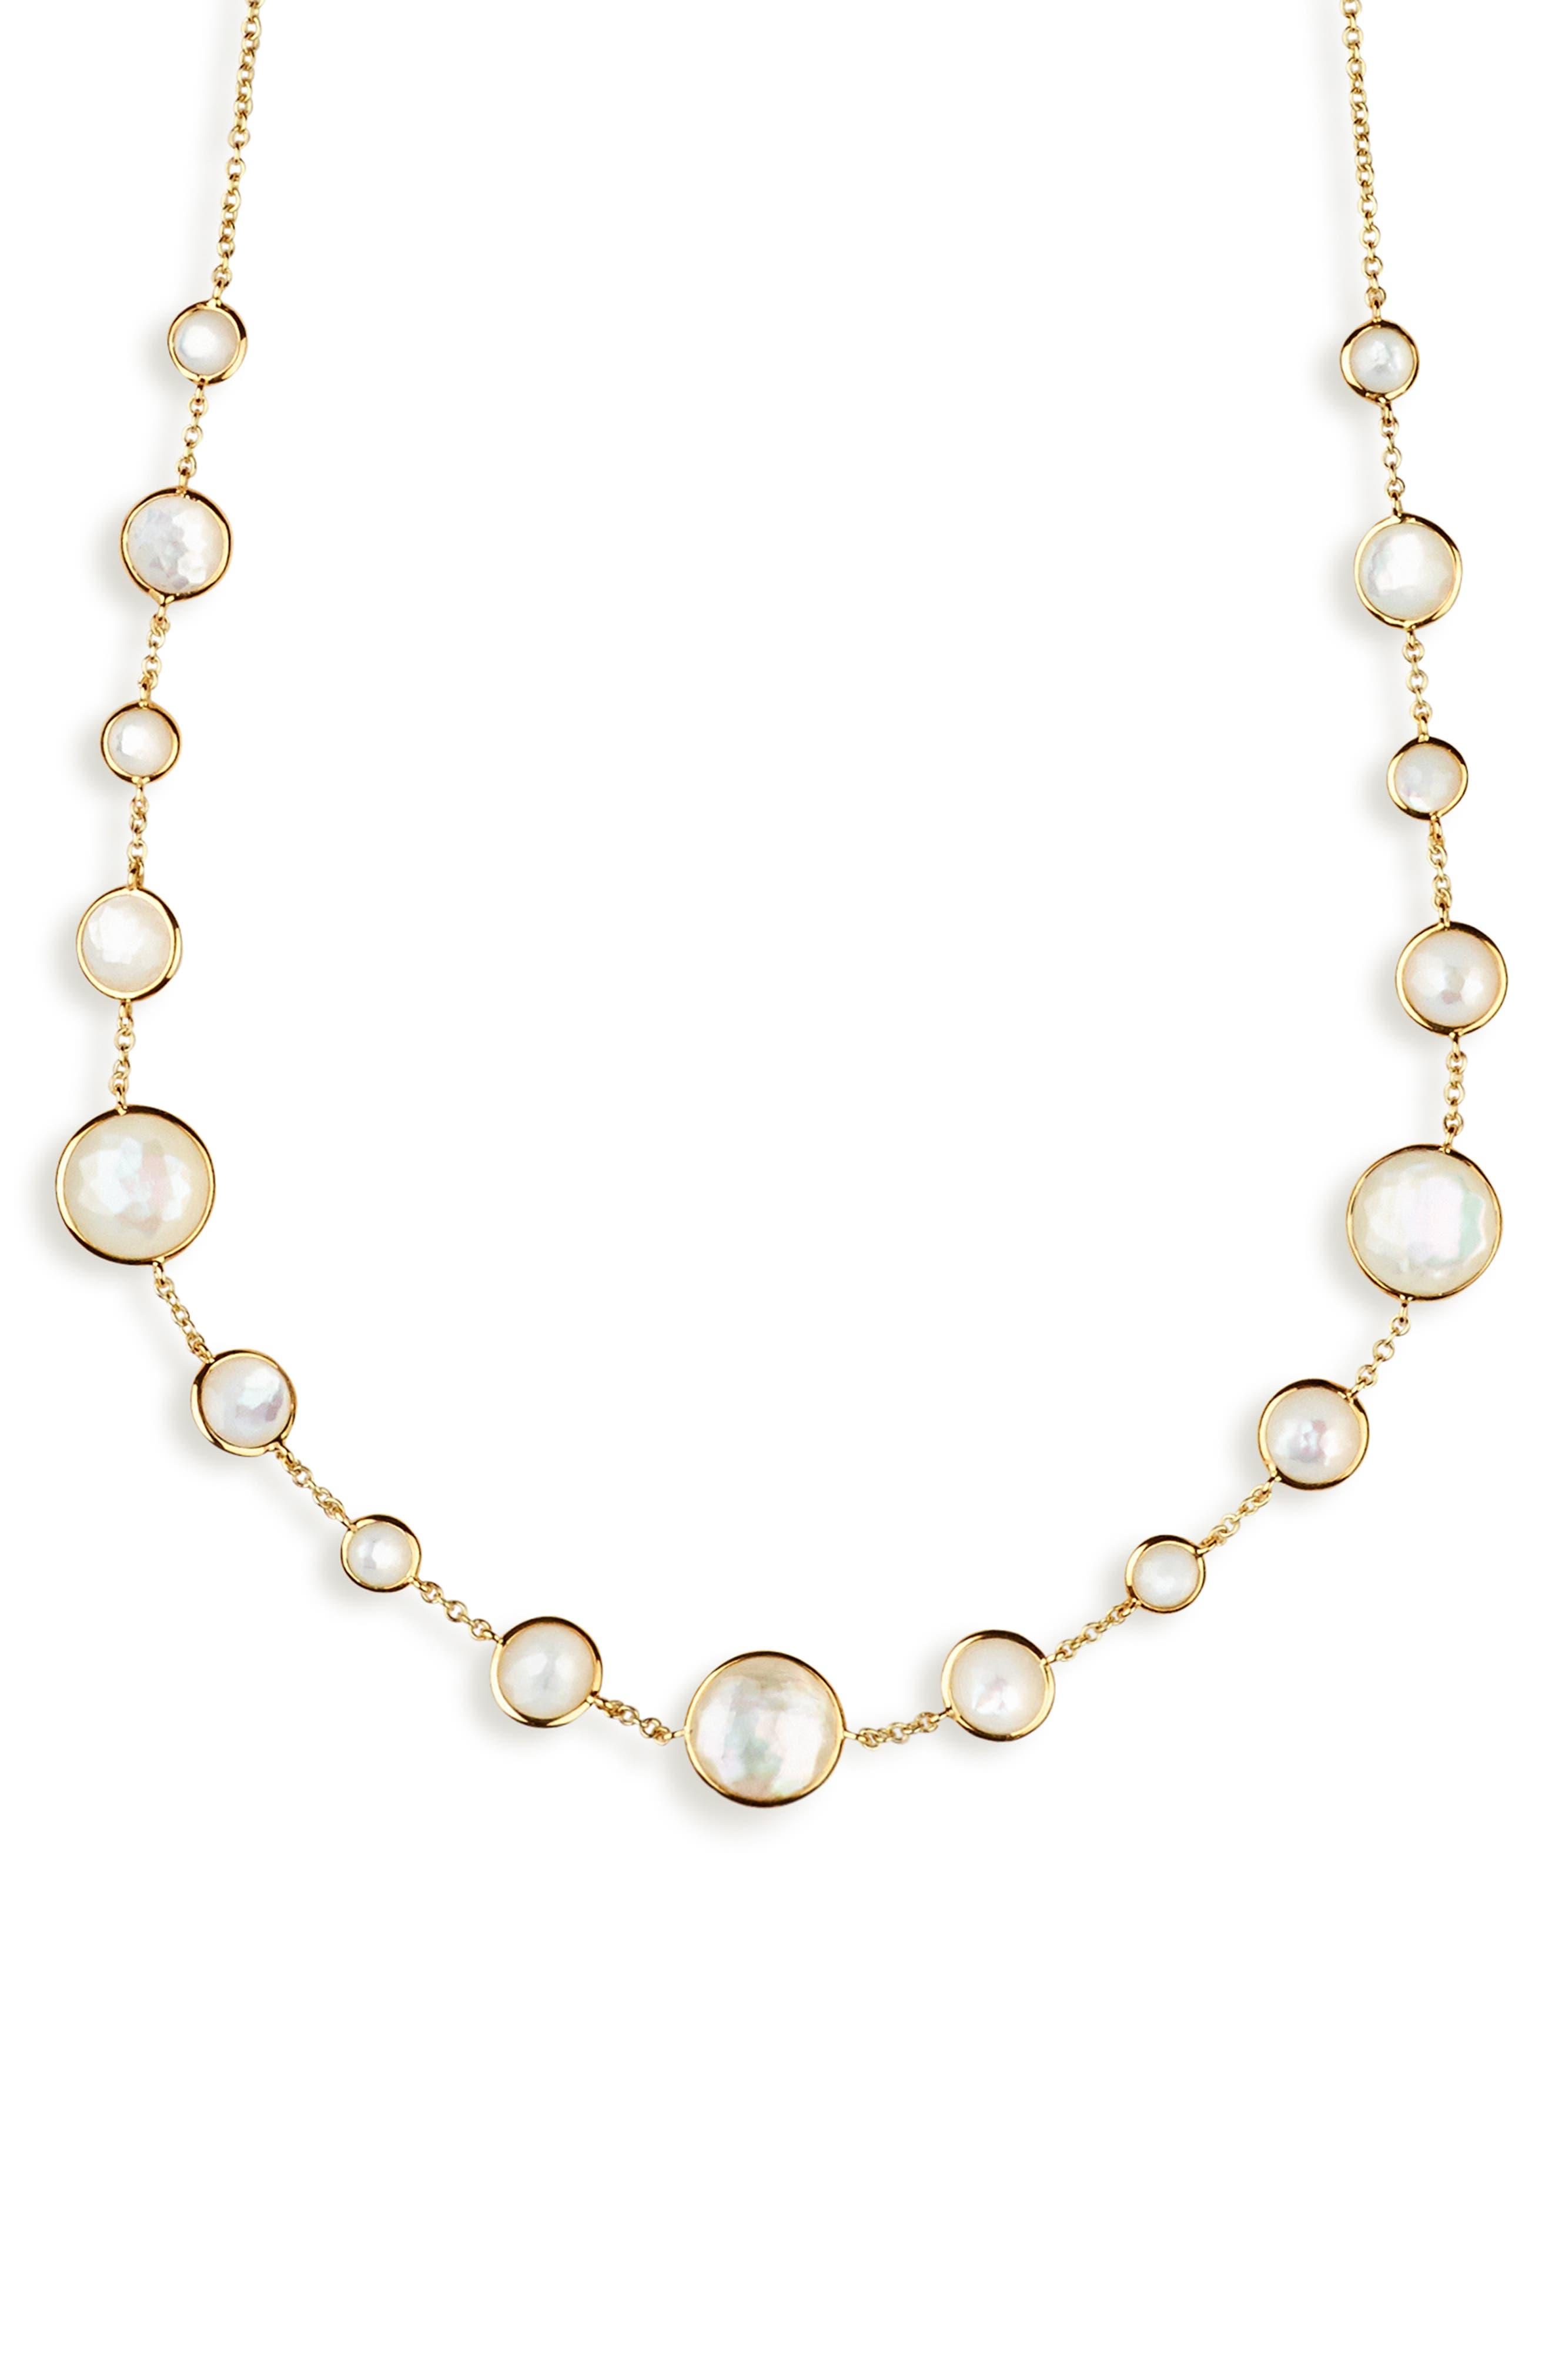 Lollipop Lollitini Necklace,                             Alternate thumbnail 2, color,                             GOLD/ PEARLS